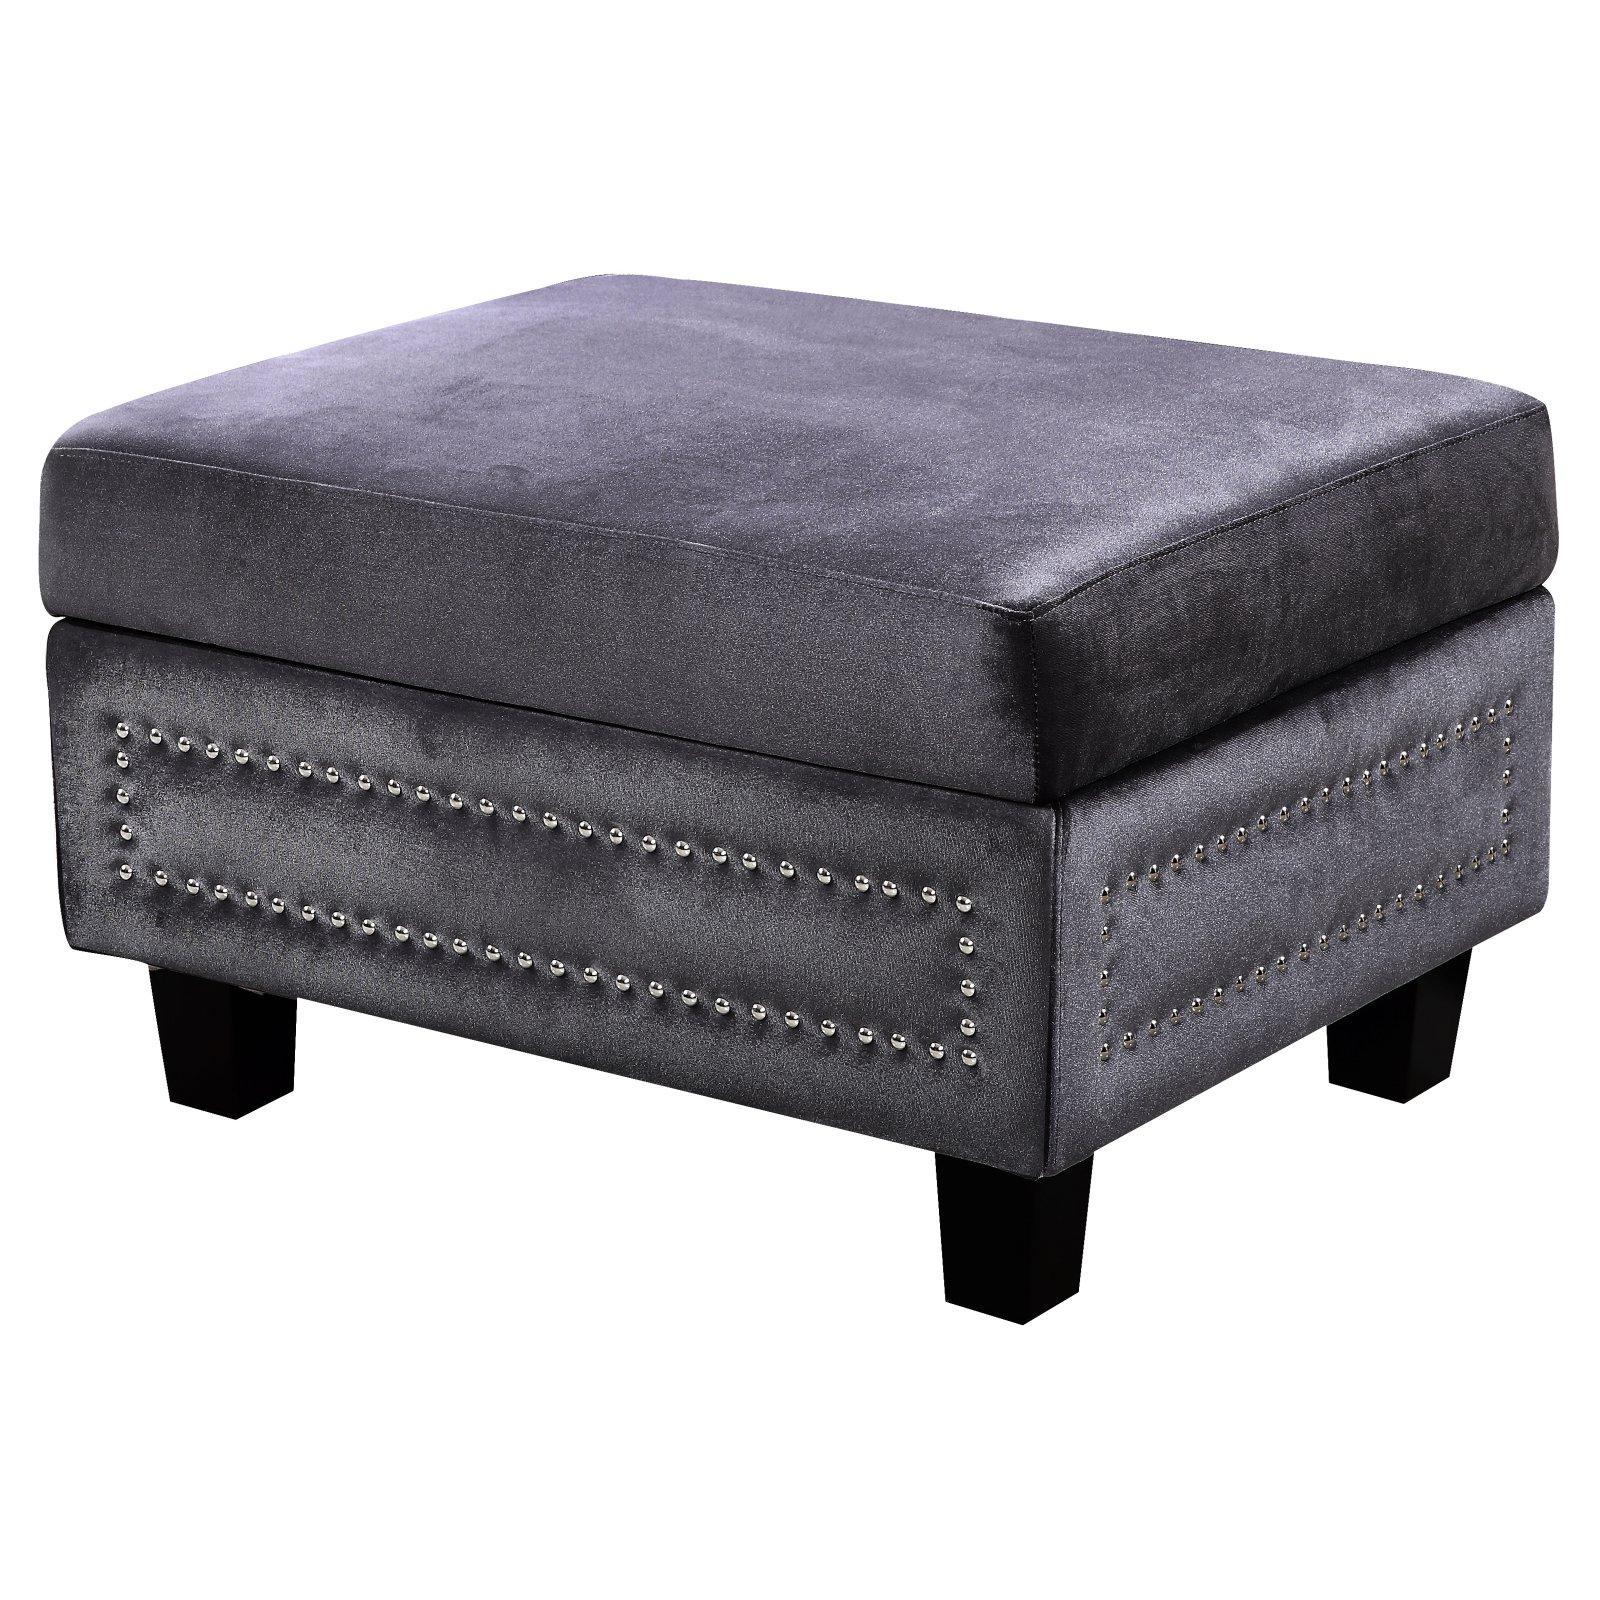 Meridian Furniture Inc Ferrara Nailhead Storage Ottoman